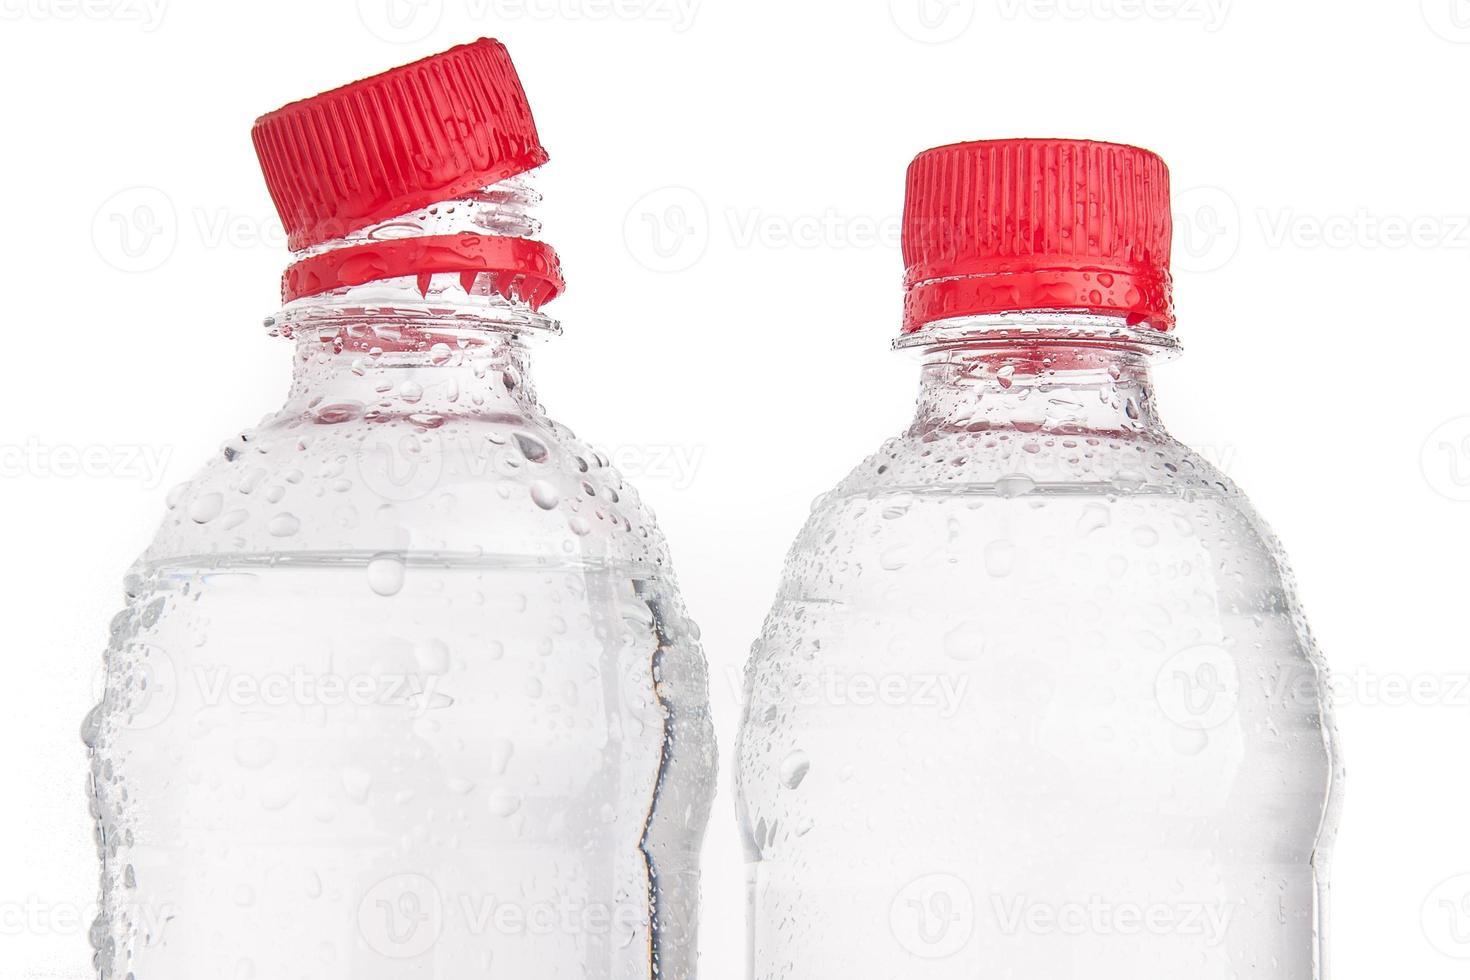 Botellas de plástico de agua potable aisladas foto